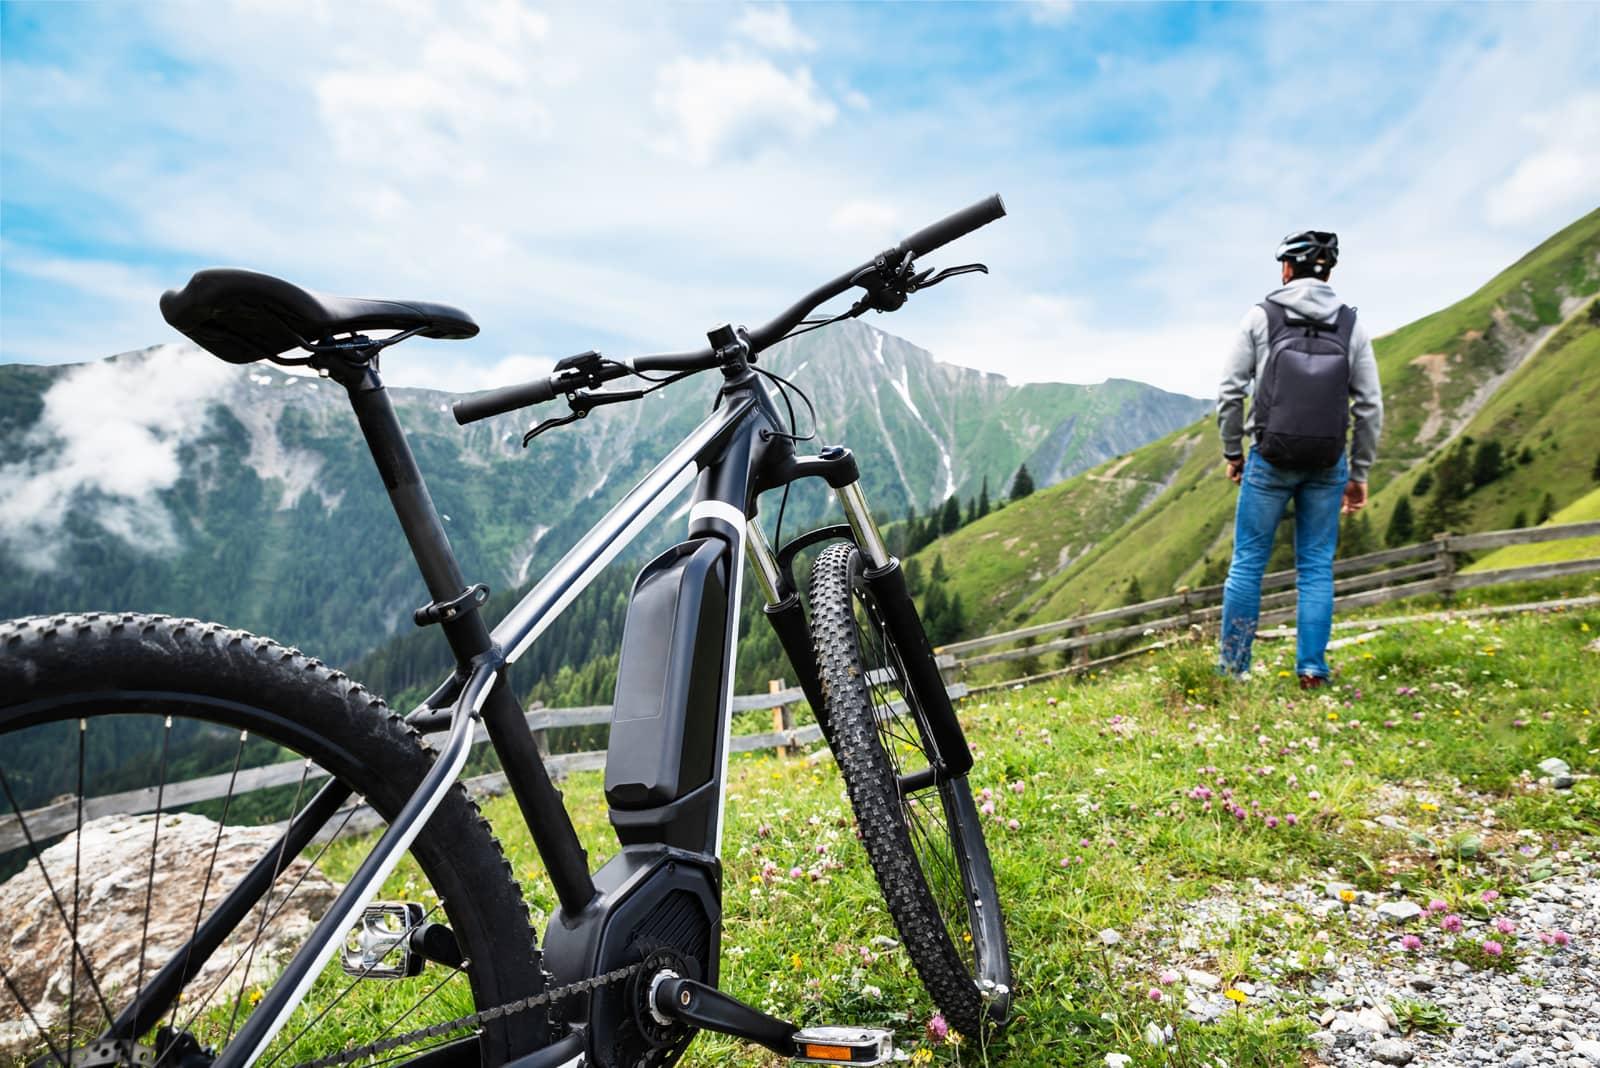 What Makes a Good All Terrain Electric Bike?